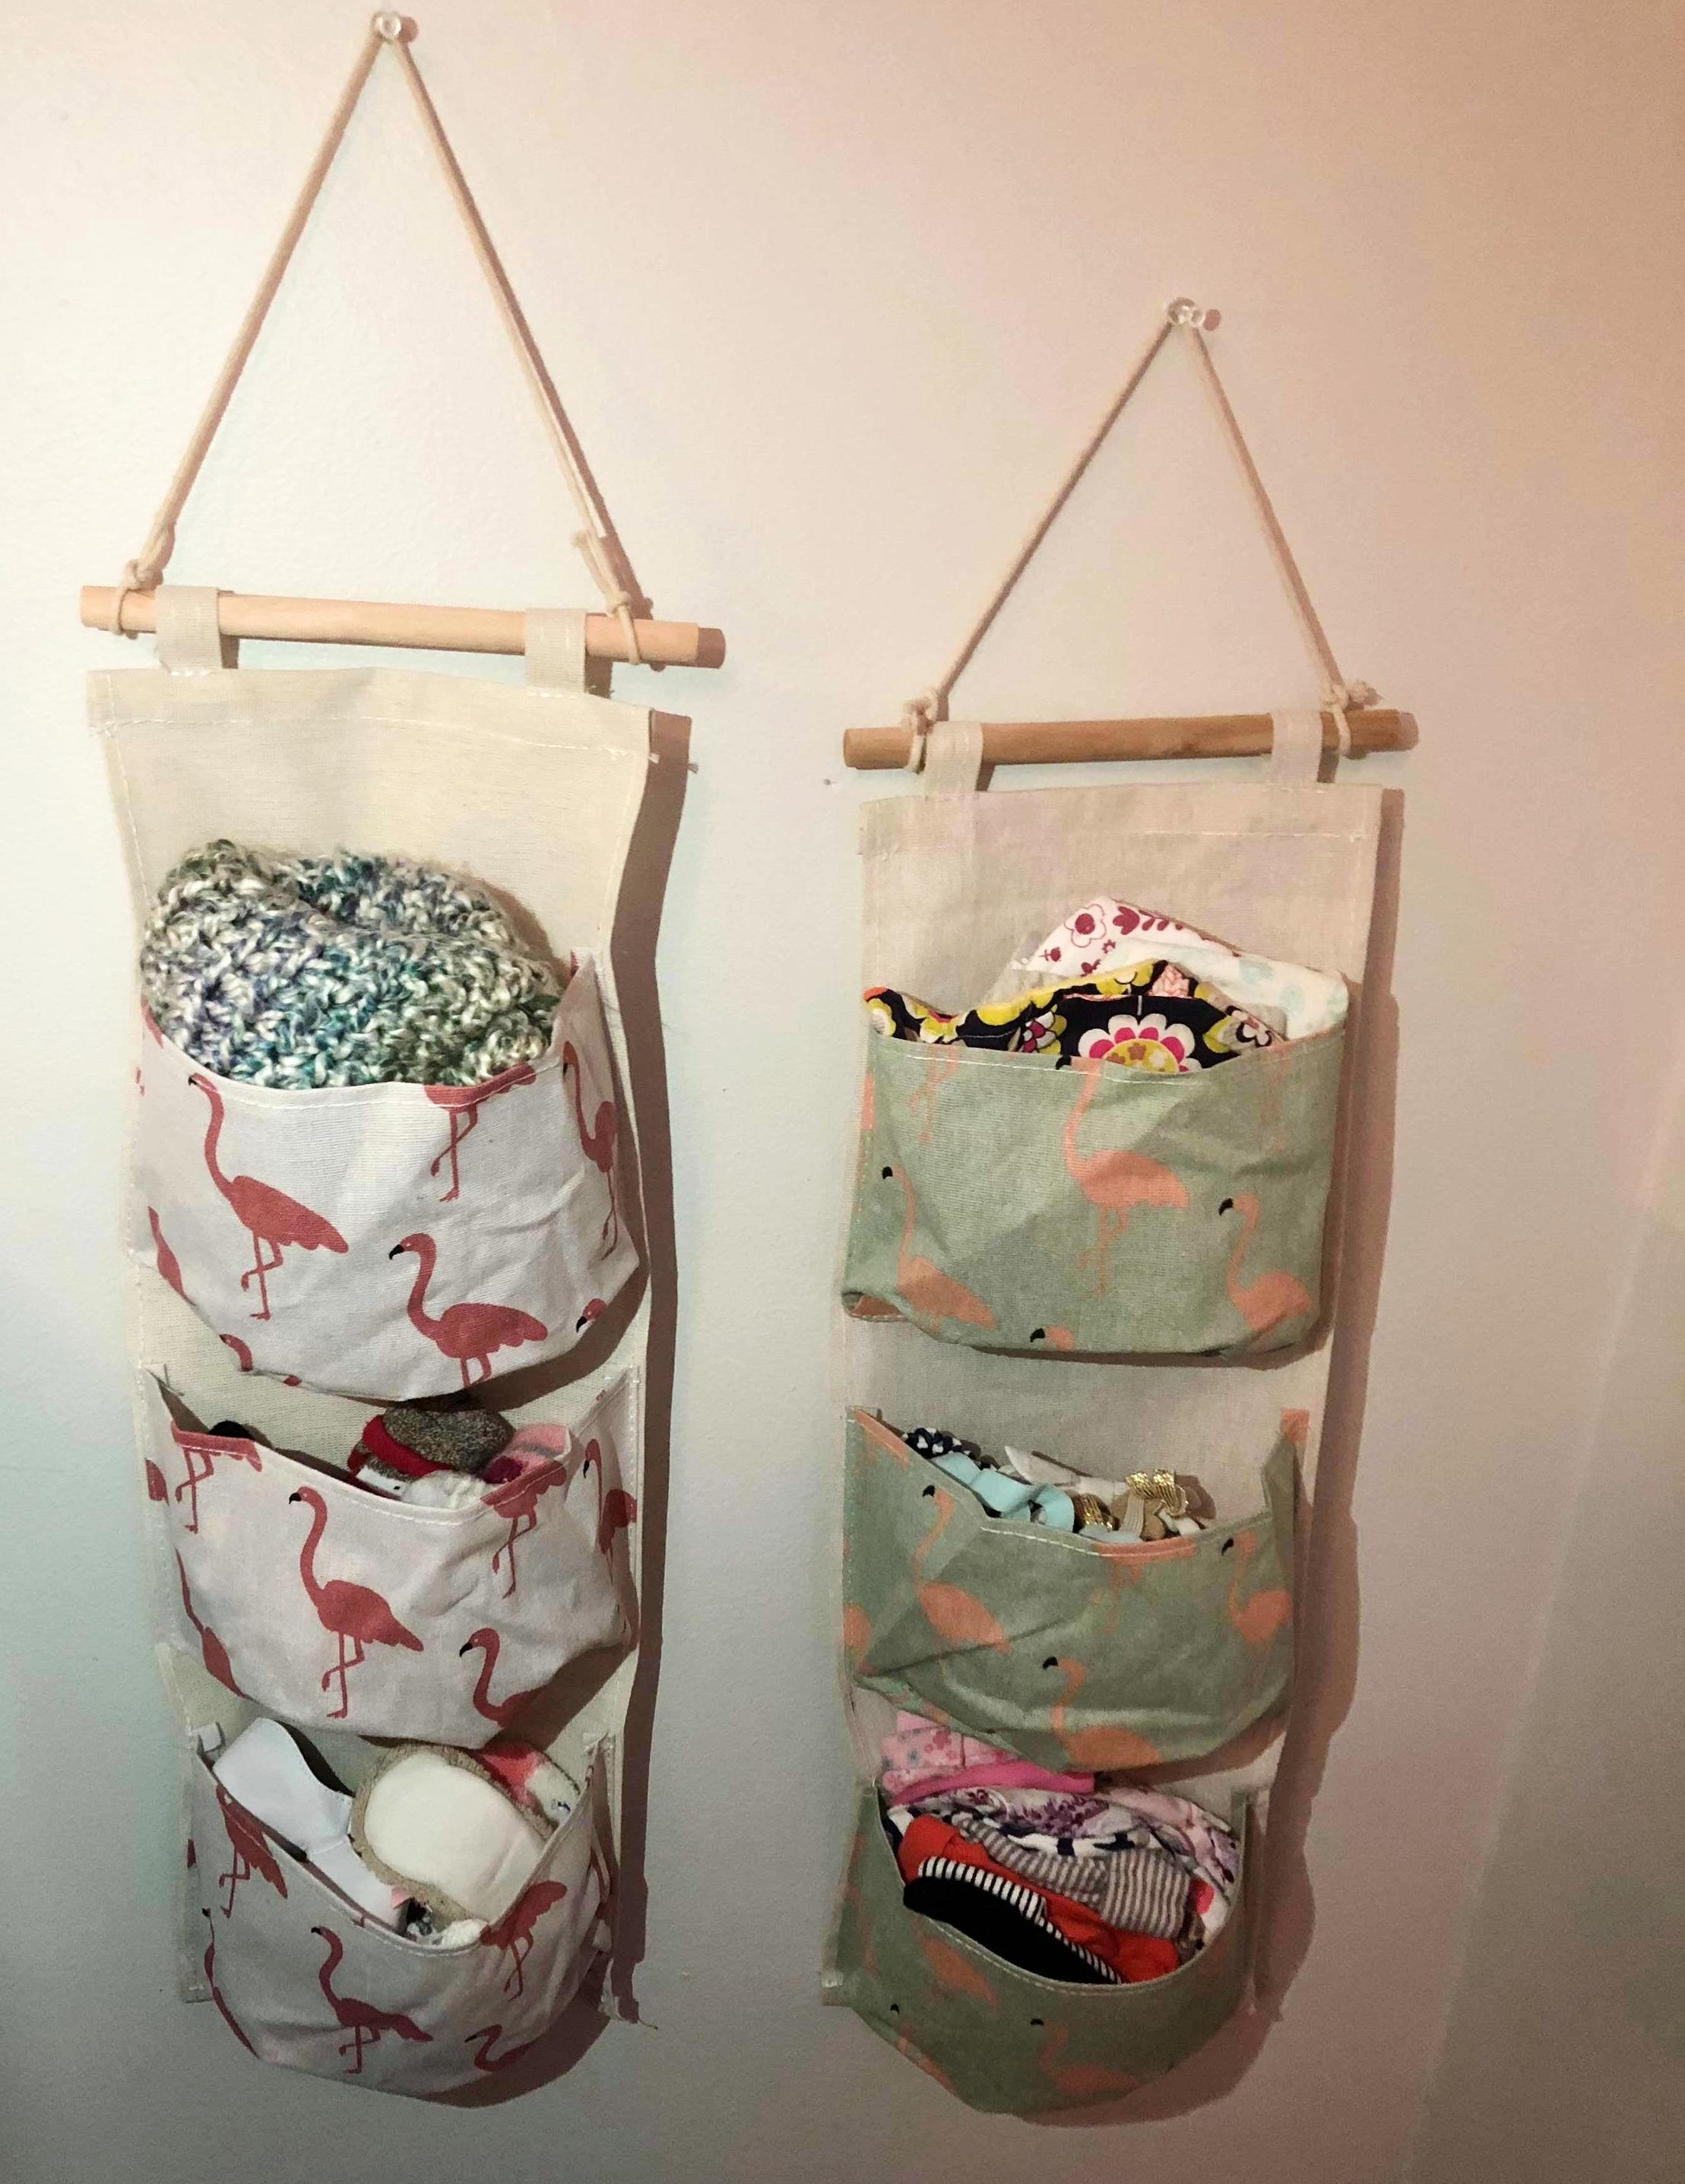 Easy Storage - 1. Fabric Hanging Storage Bags: Amazon